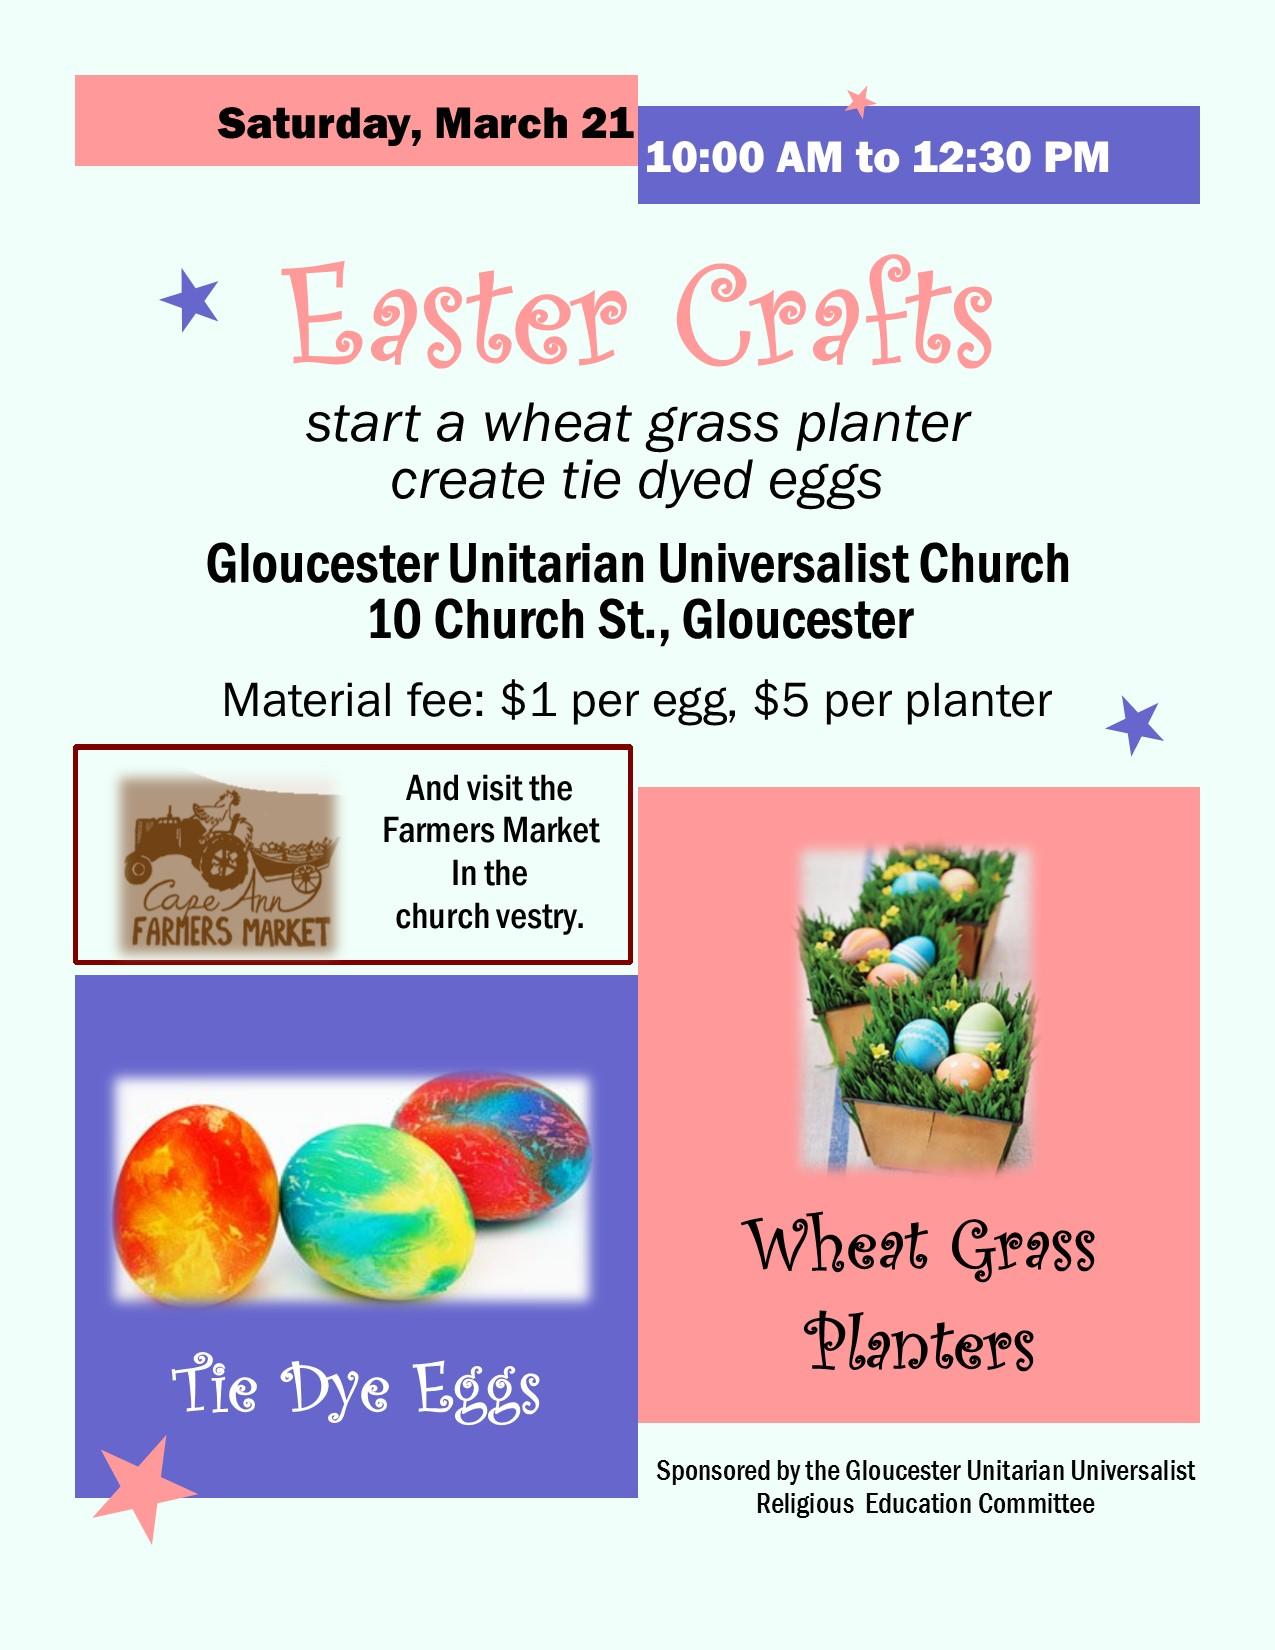 Easter Crafts Flyer Gloucester Unitarian Universalist Church